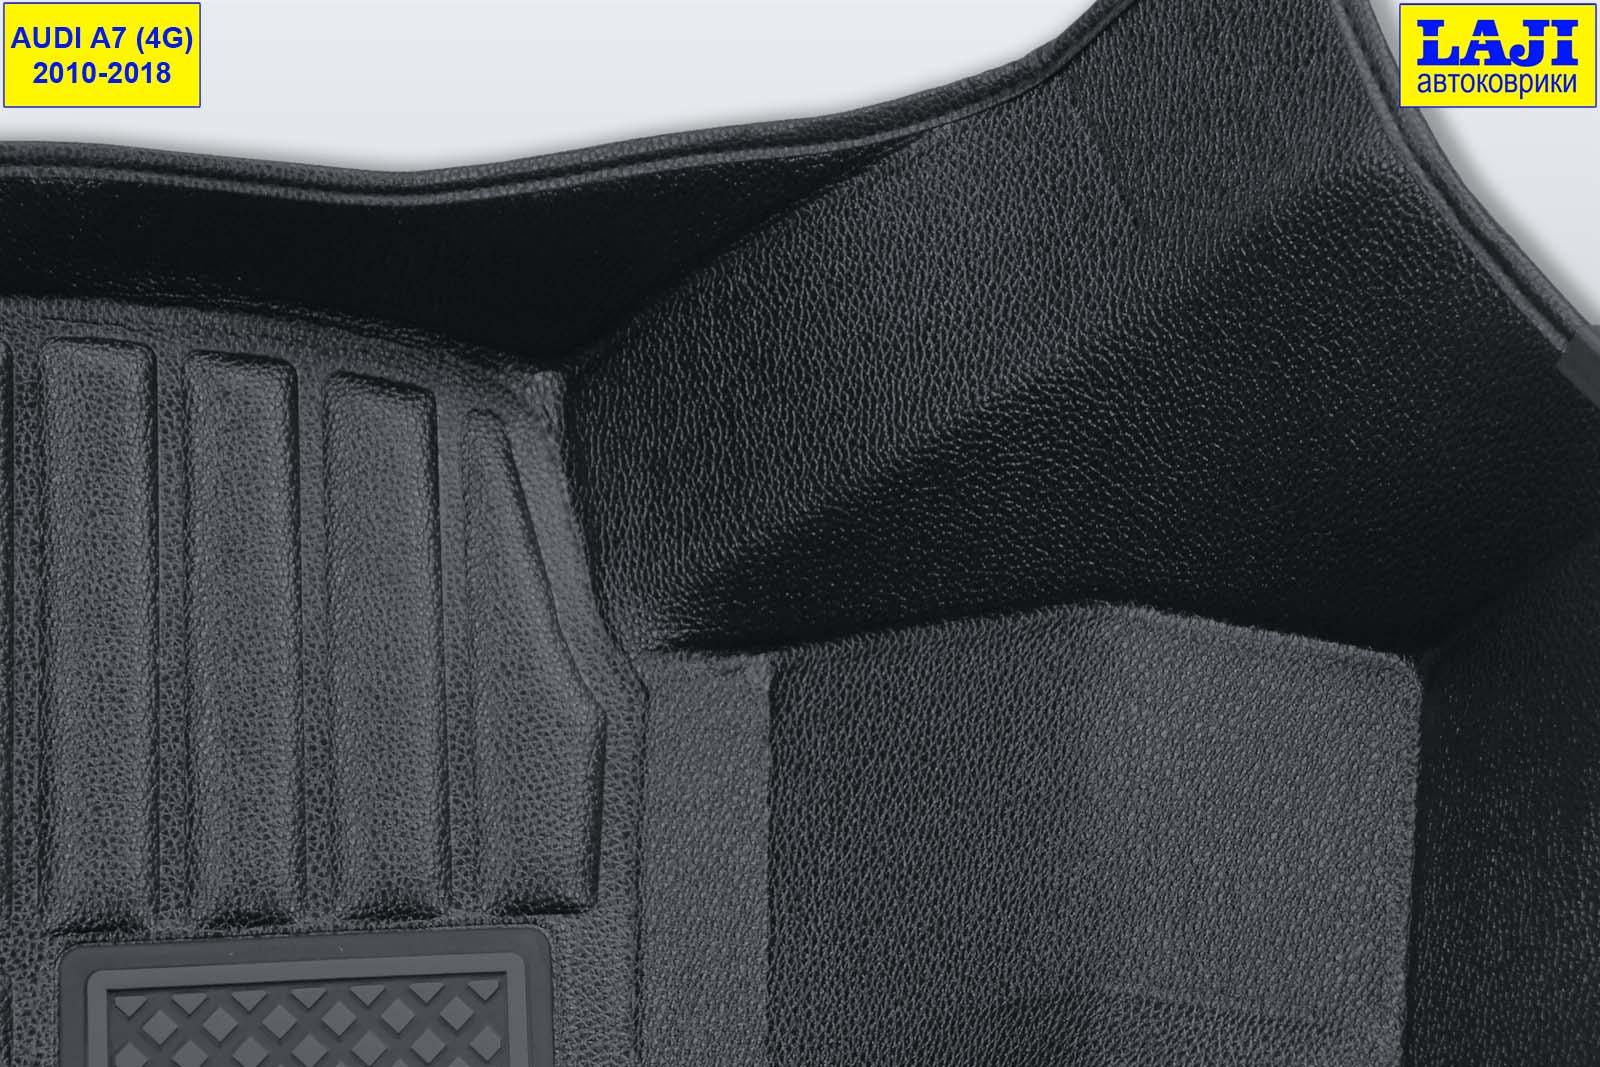 5D коврики для Audi A7 4G 2010-2018 6